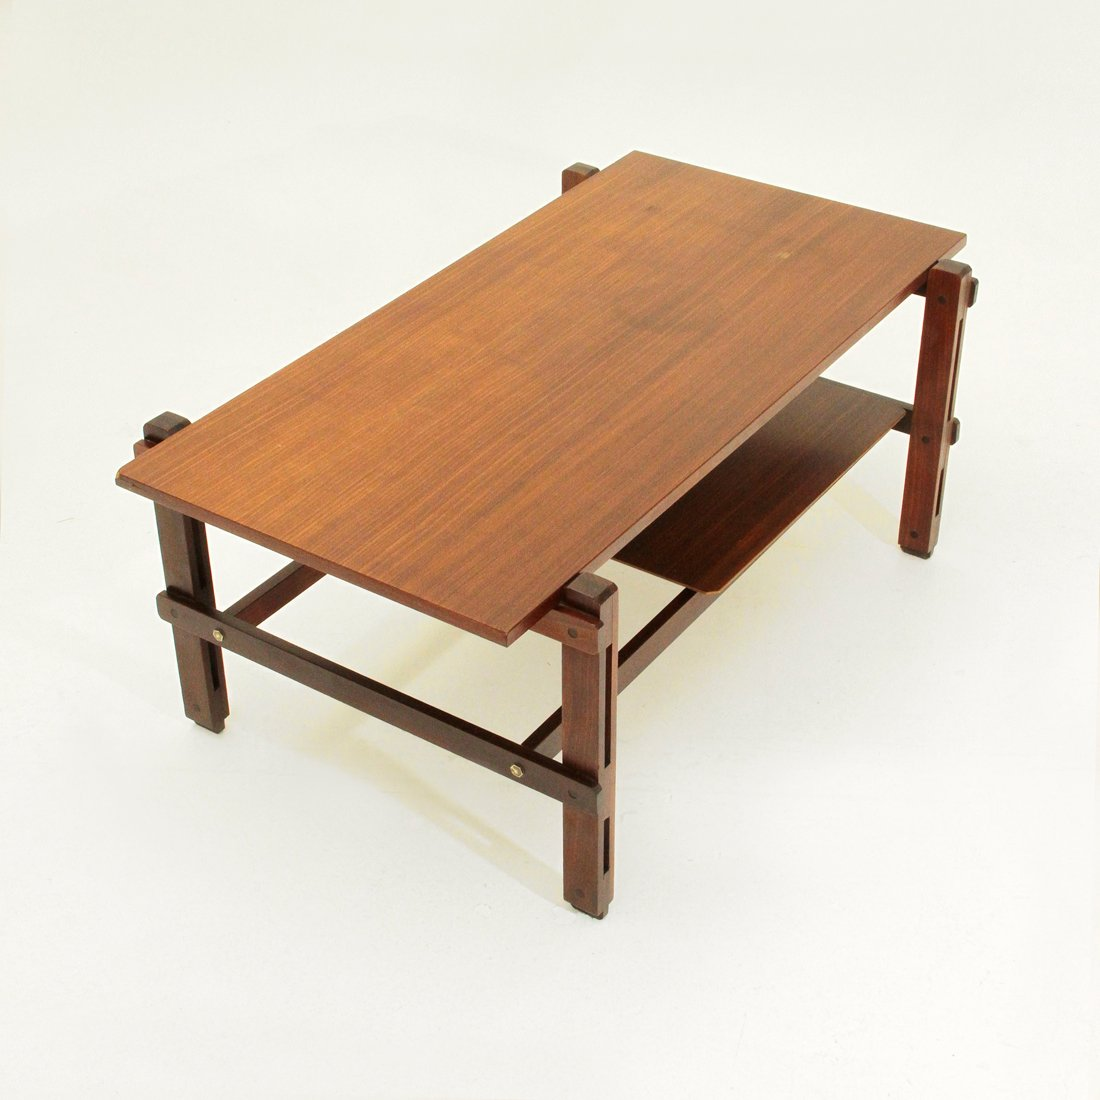 Mid-Century Italian Teak Coffee Table, 1960s For Sale At